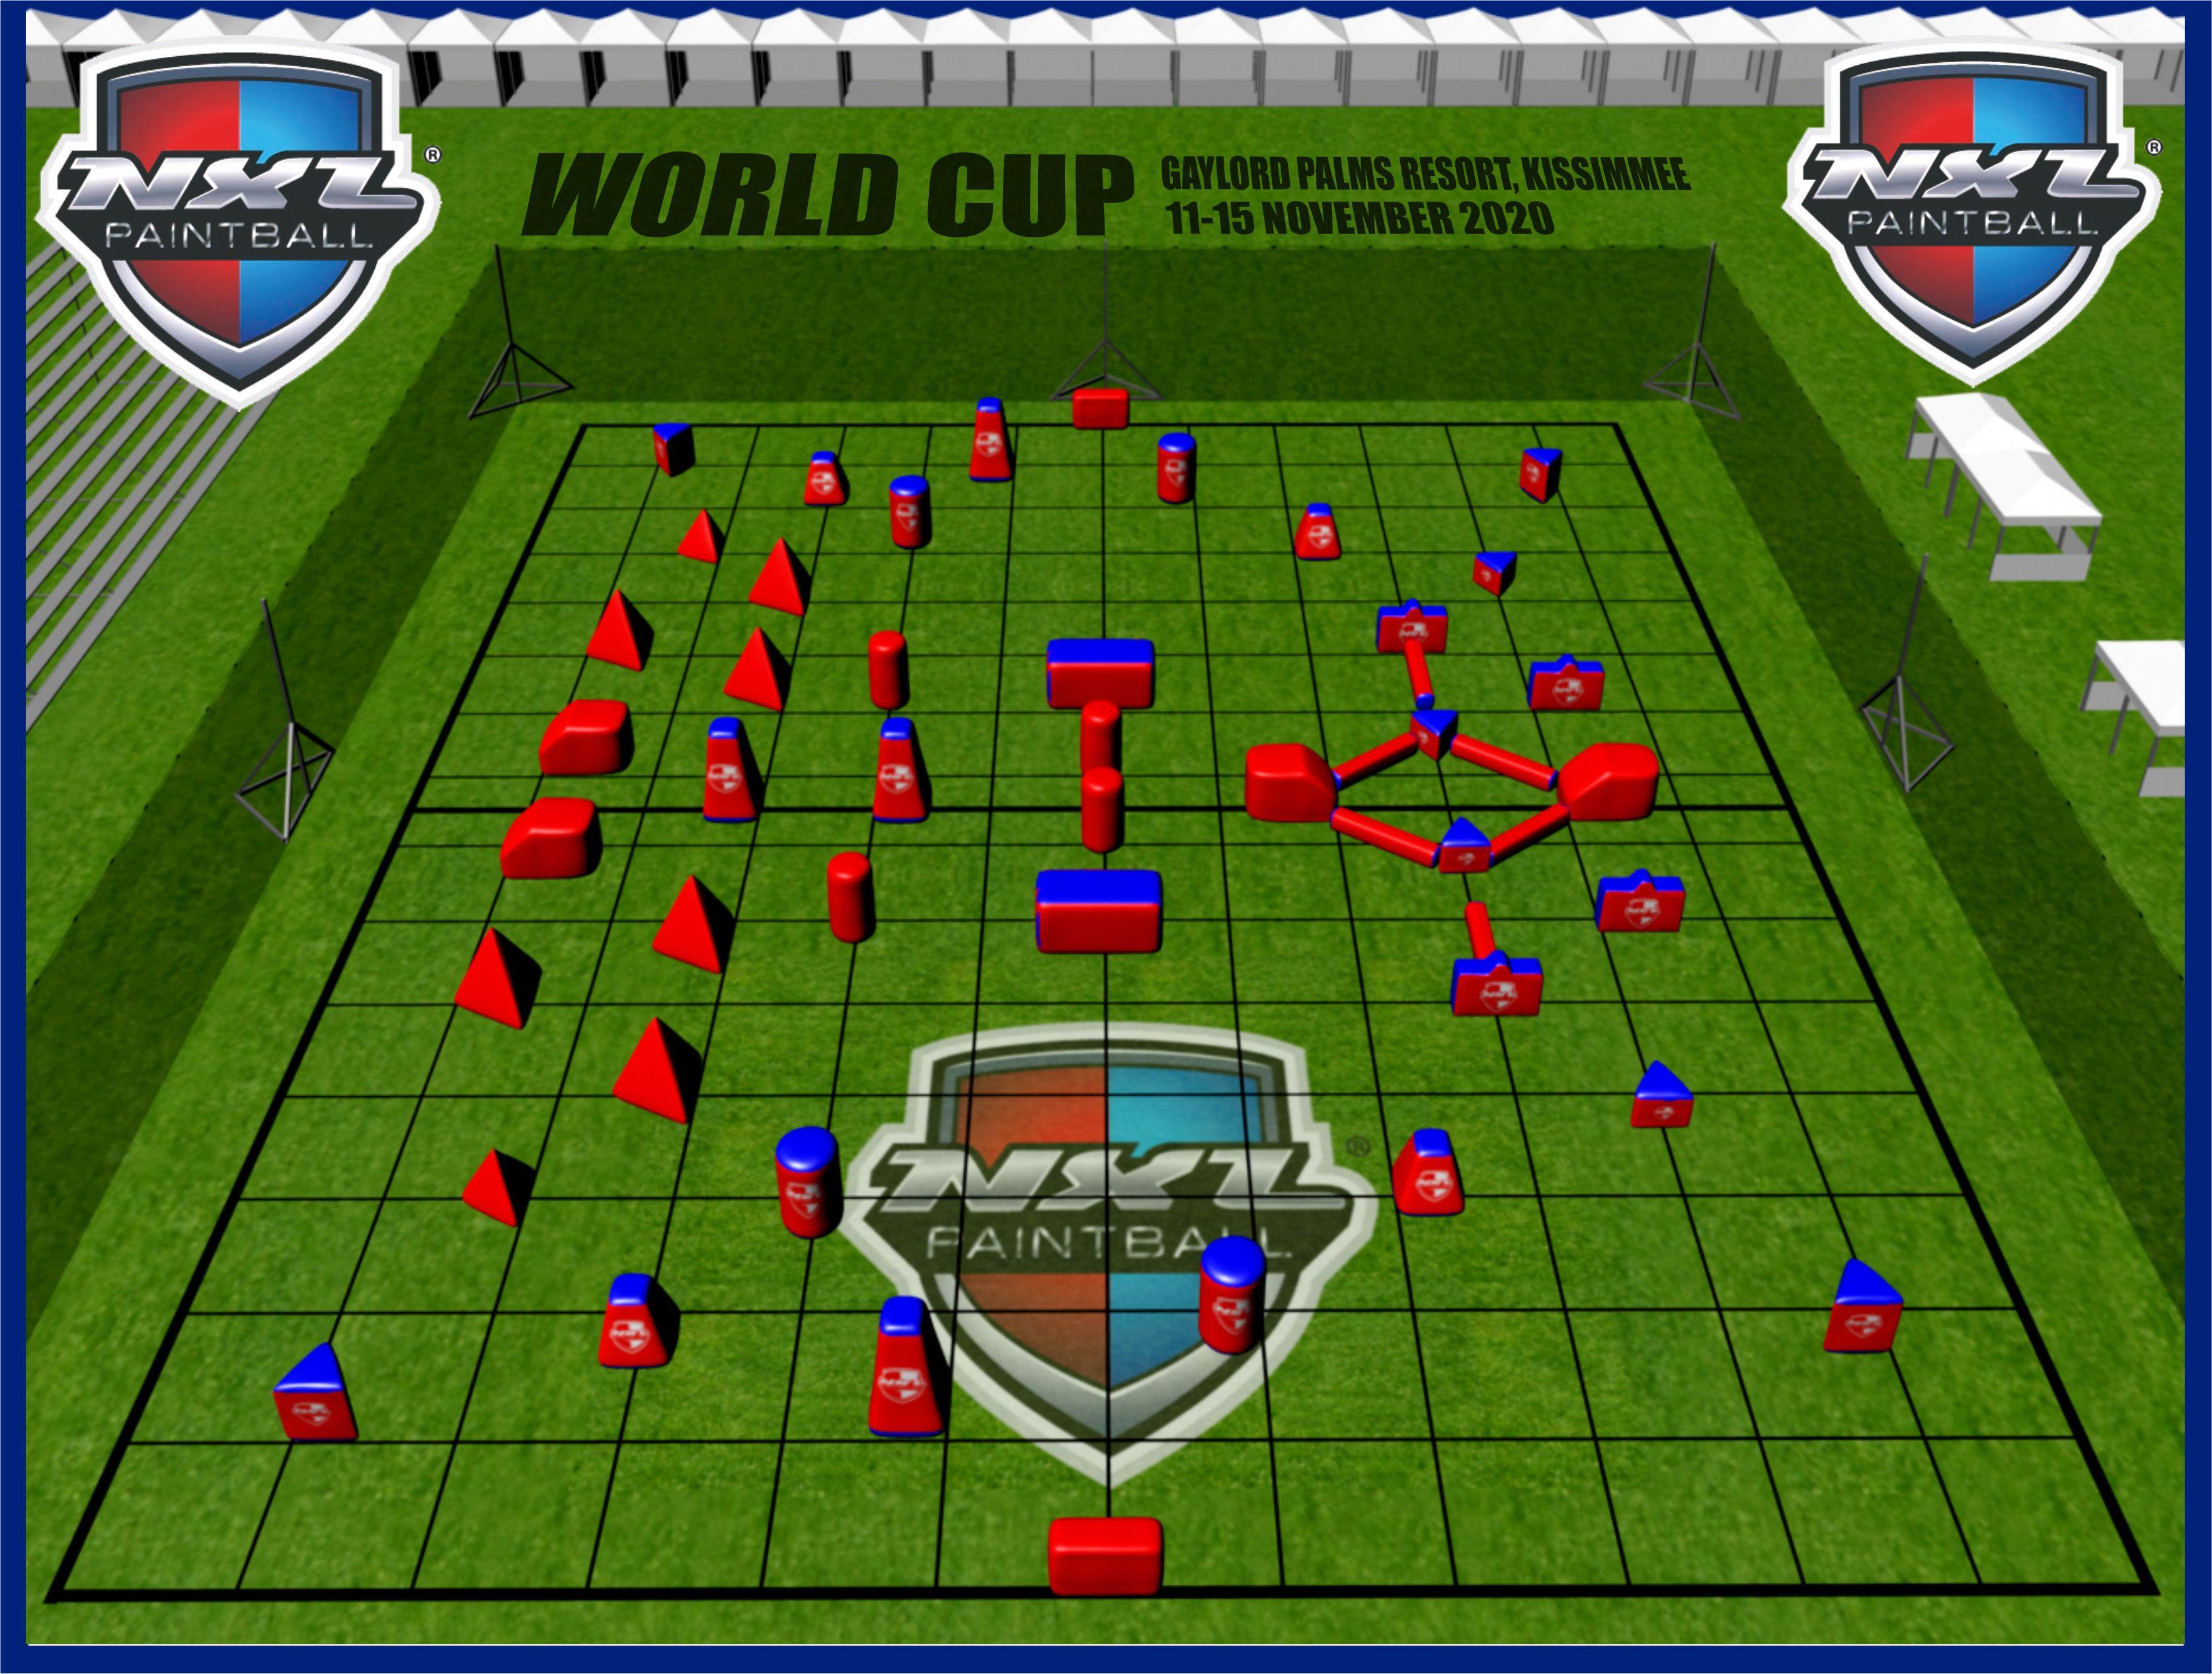 2020nxl WC layout_1.jpg